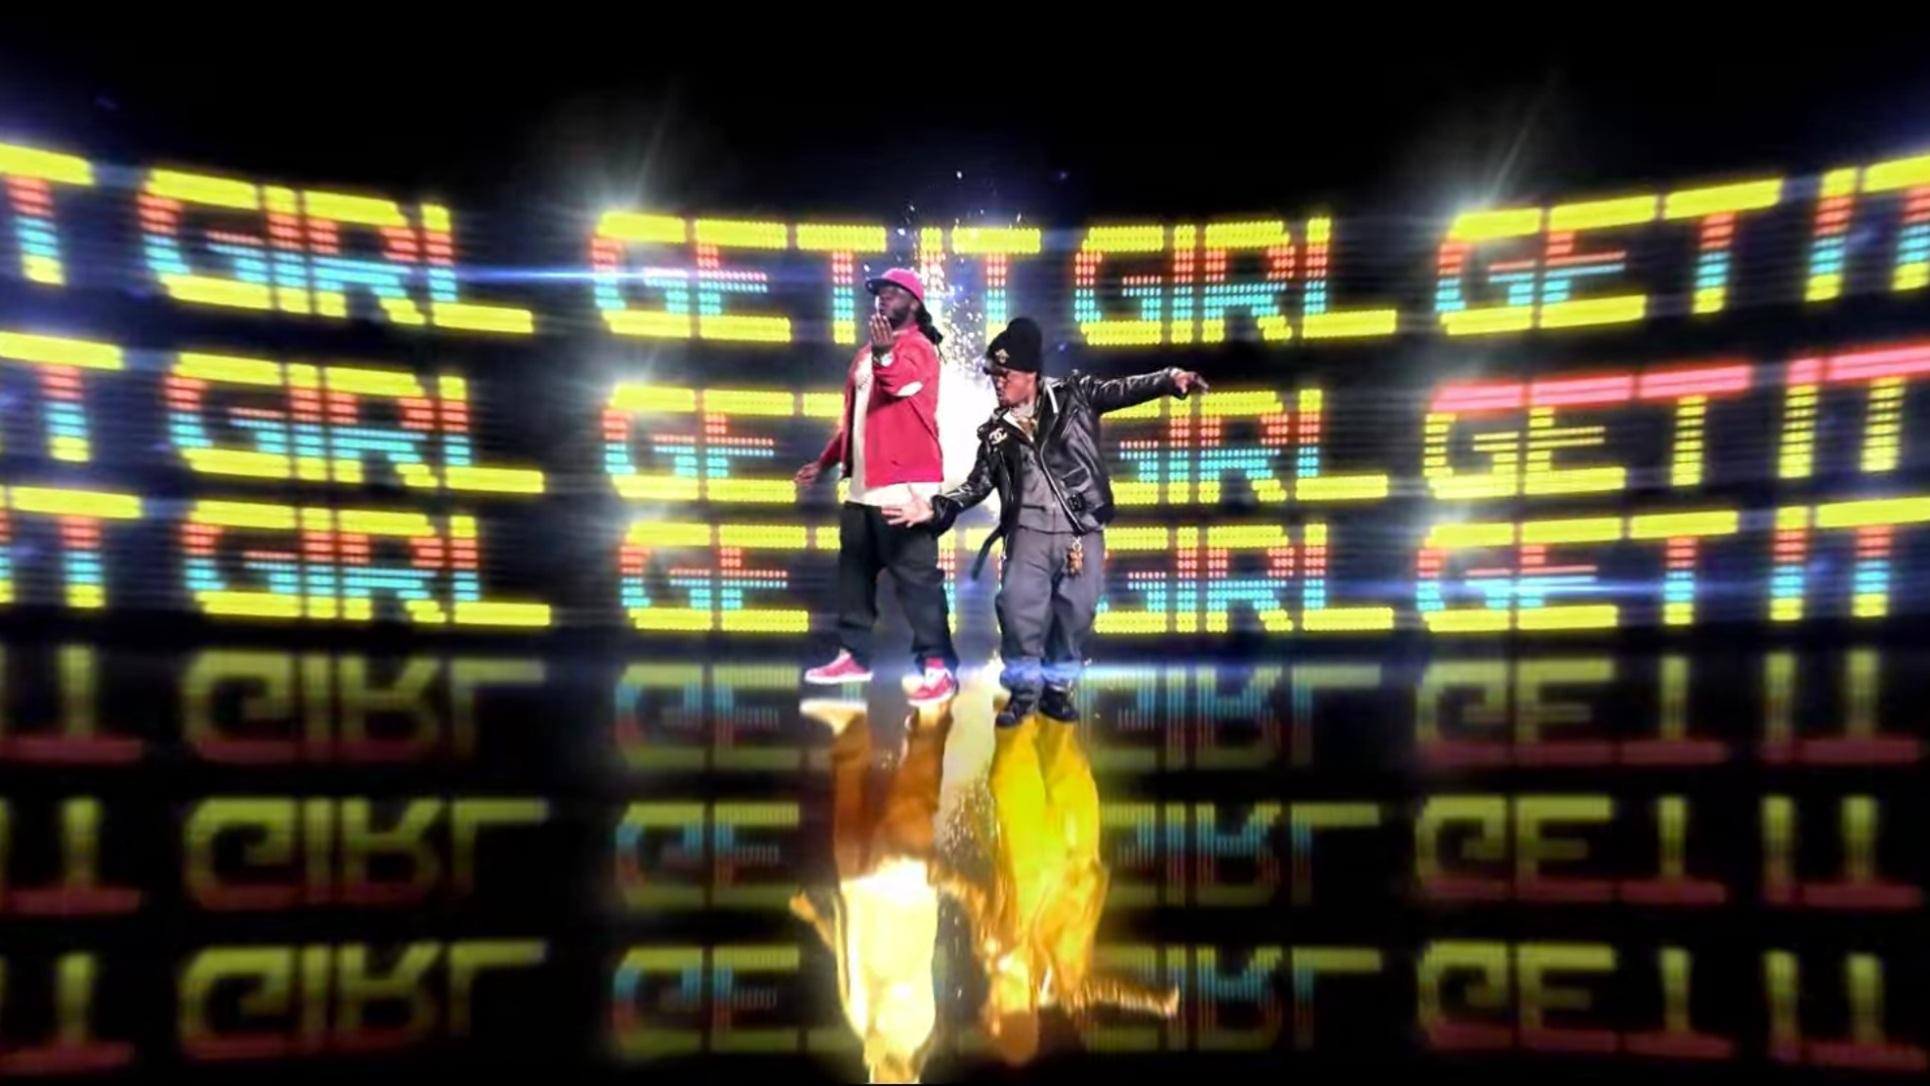 Mann ft T-Pain - 'Get it Girl'